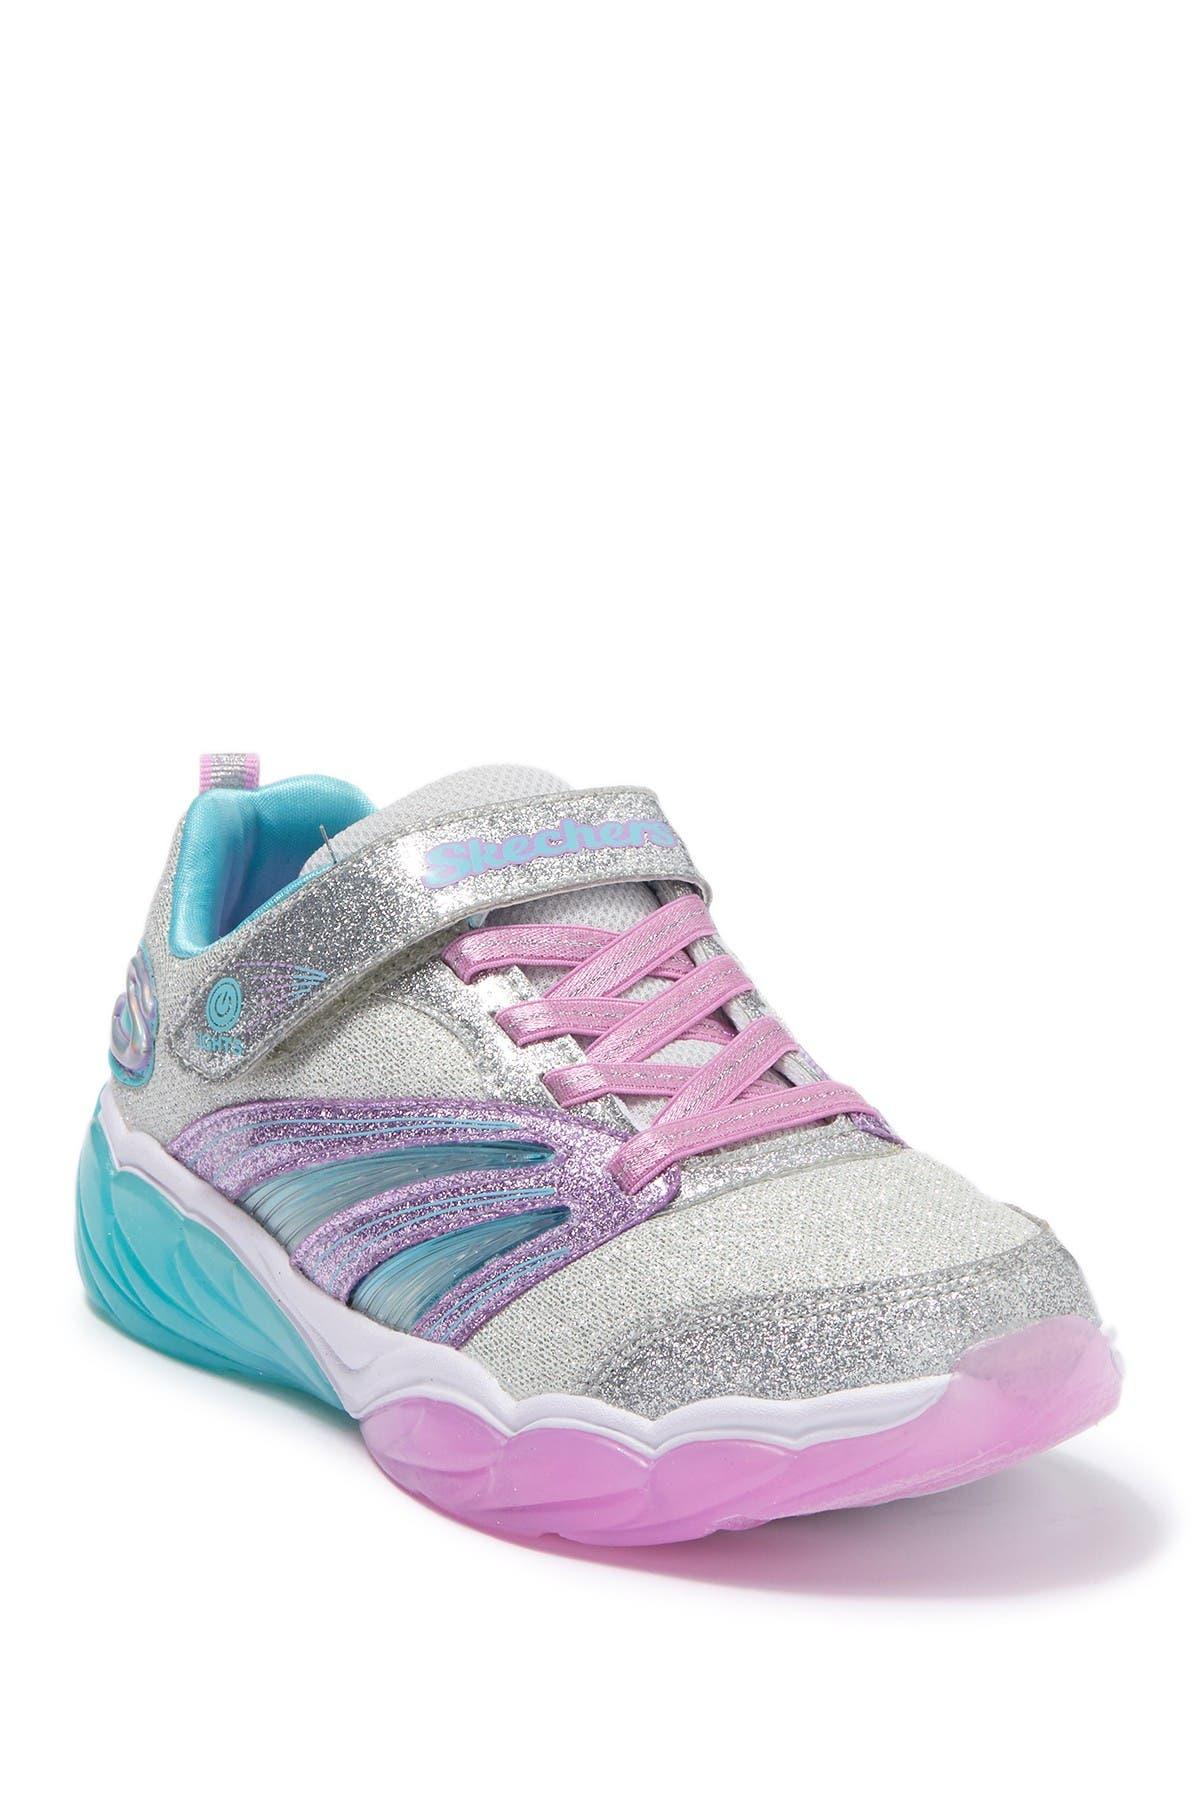 Image of Skechers Fusion Flash Sneaker